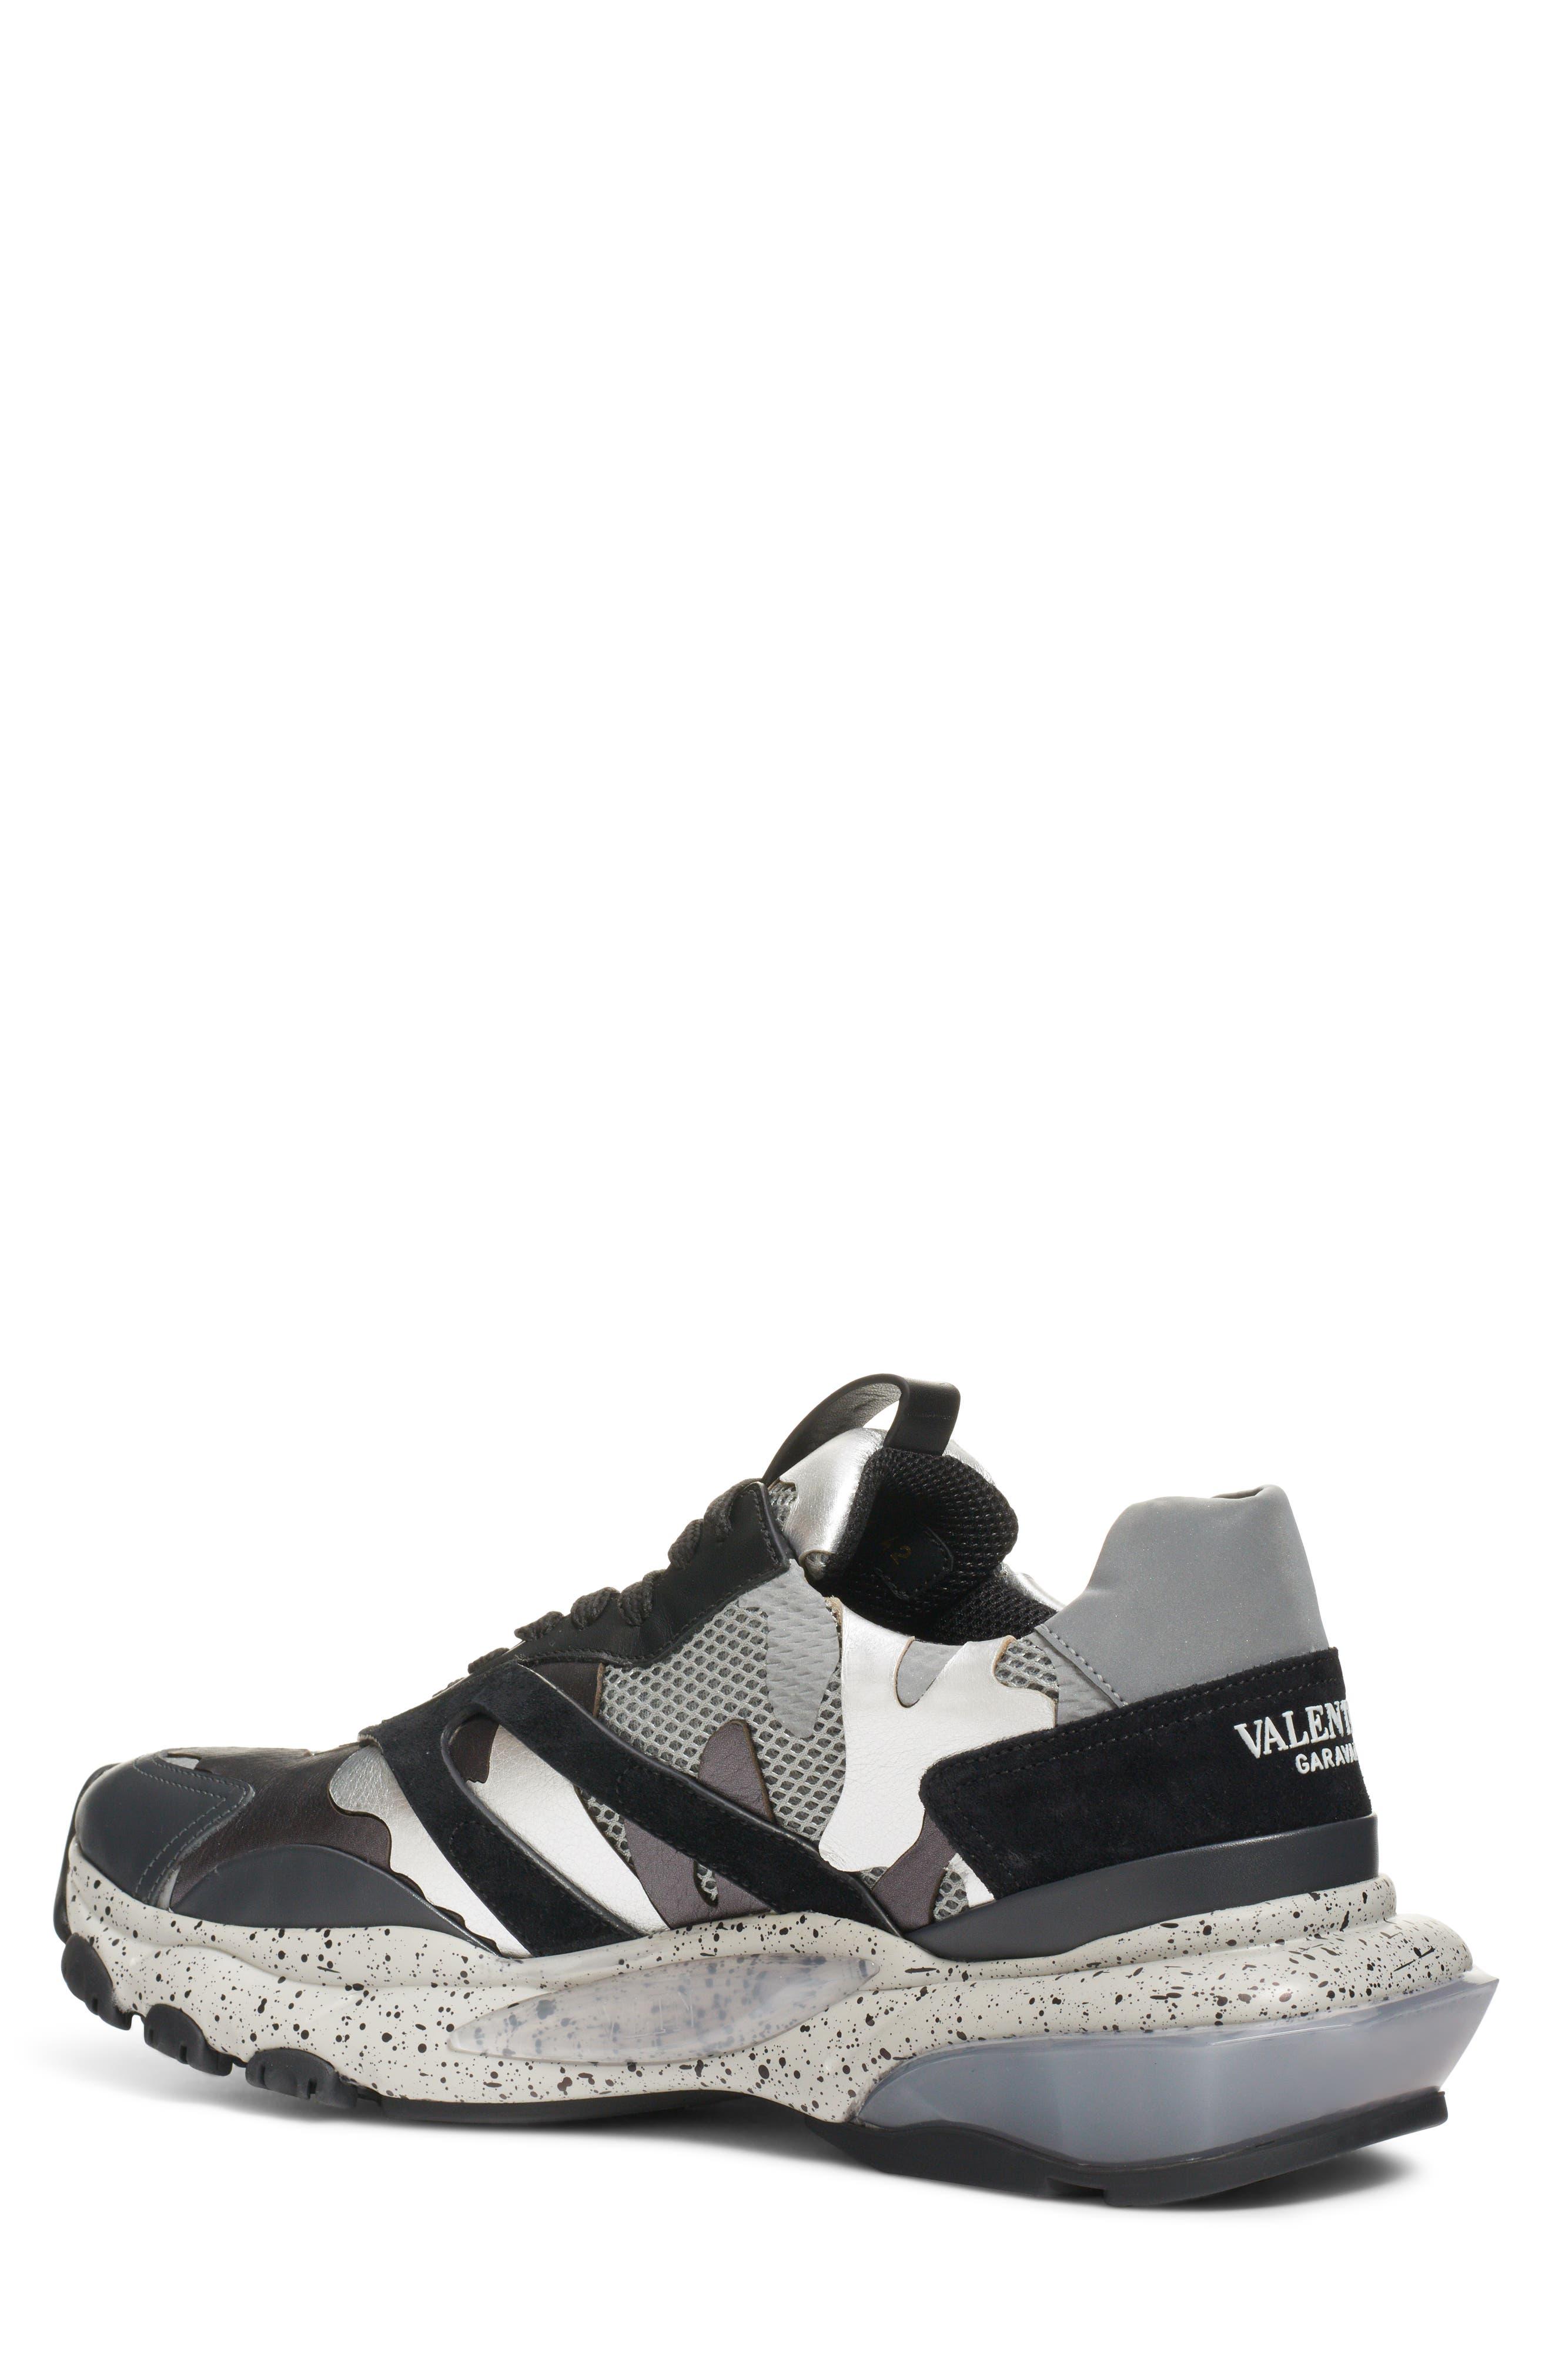 Bounce Sneaker,                             Alternate thumbnail 2, color,                             DARK SILVER/ BLACK